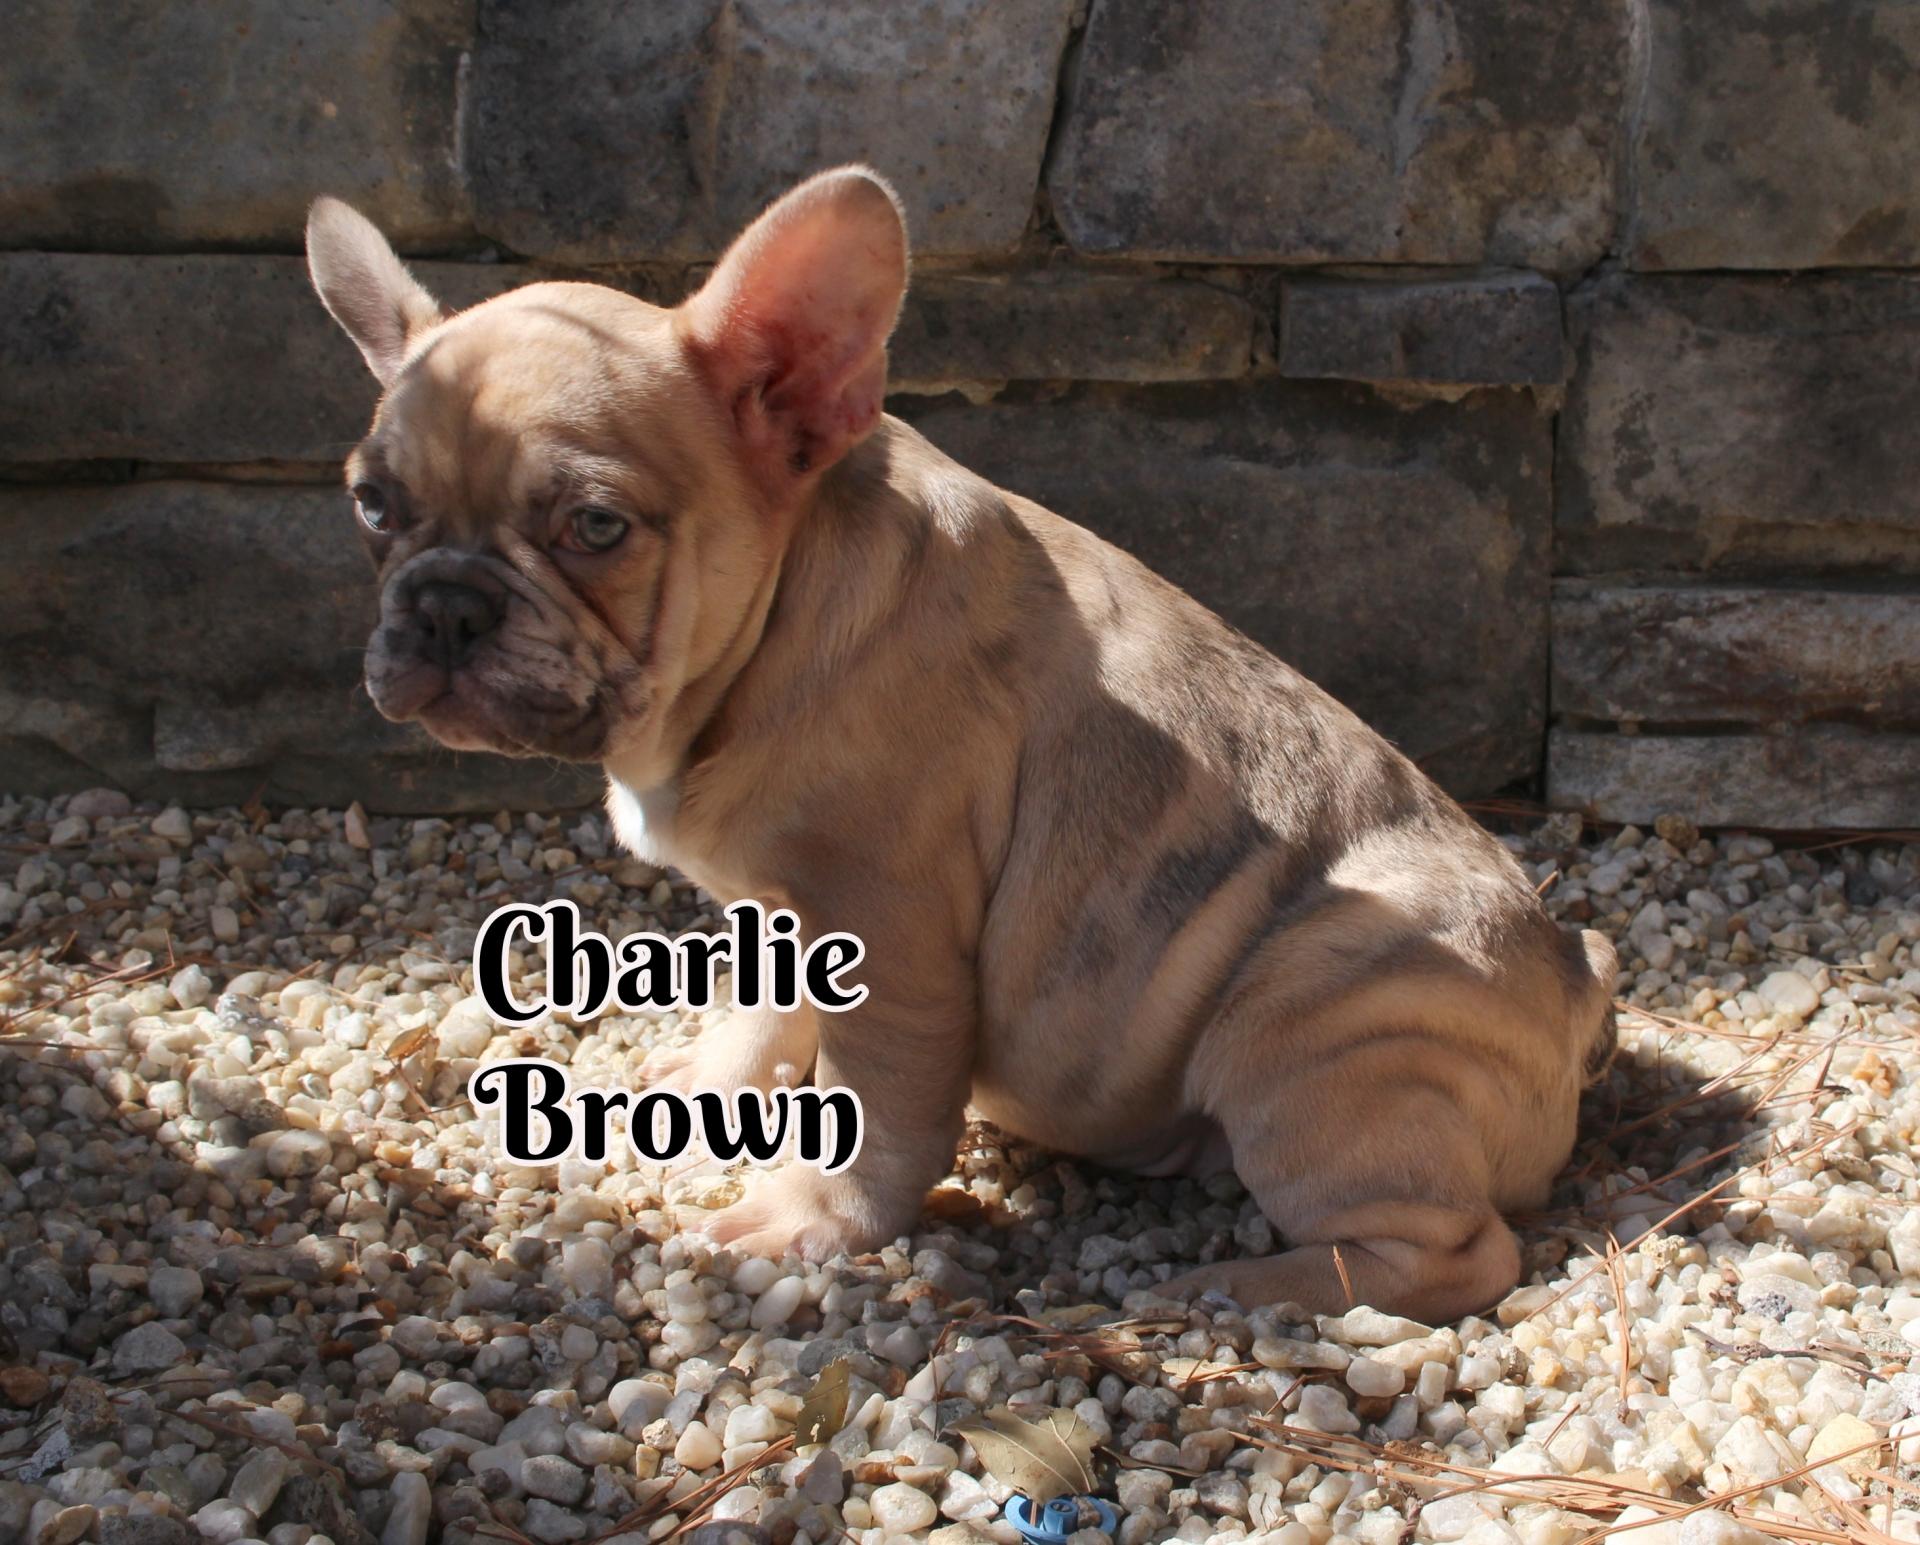 #FrenchBulldogPuppies #MerleFrenchBulldog #Frenchie #AvailablePuppies #AKCRegFrenchBulldog #SouthernTerritoryFrenchies #CharlieBrown